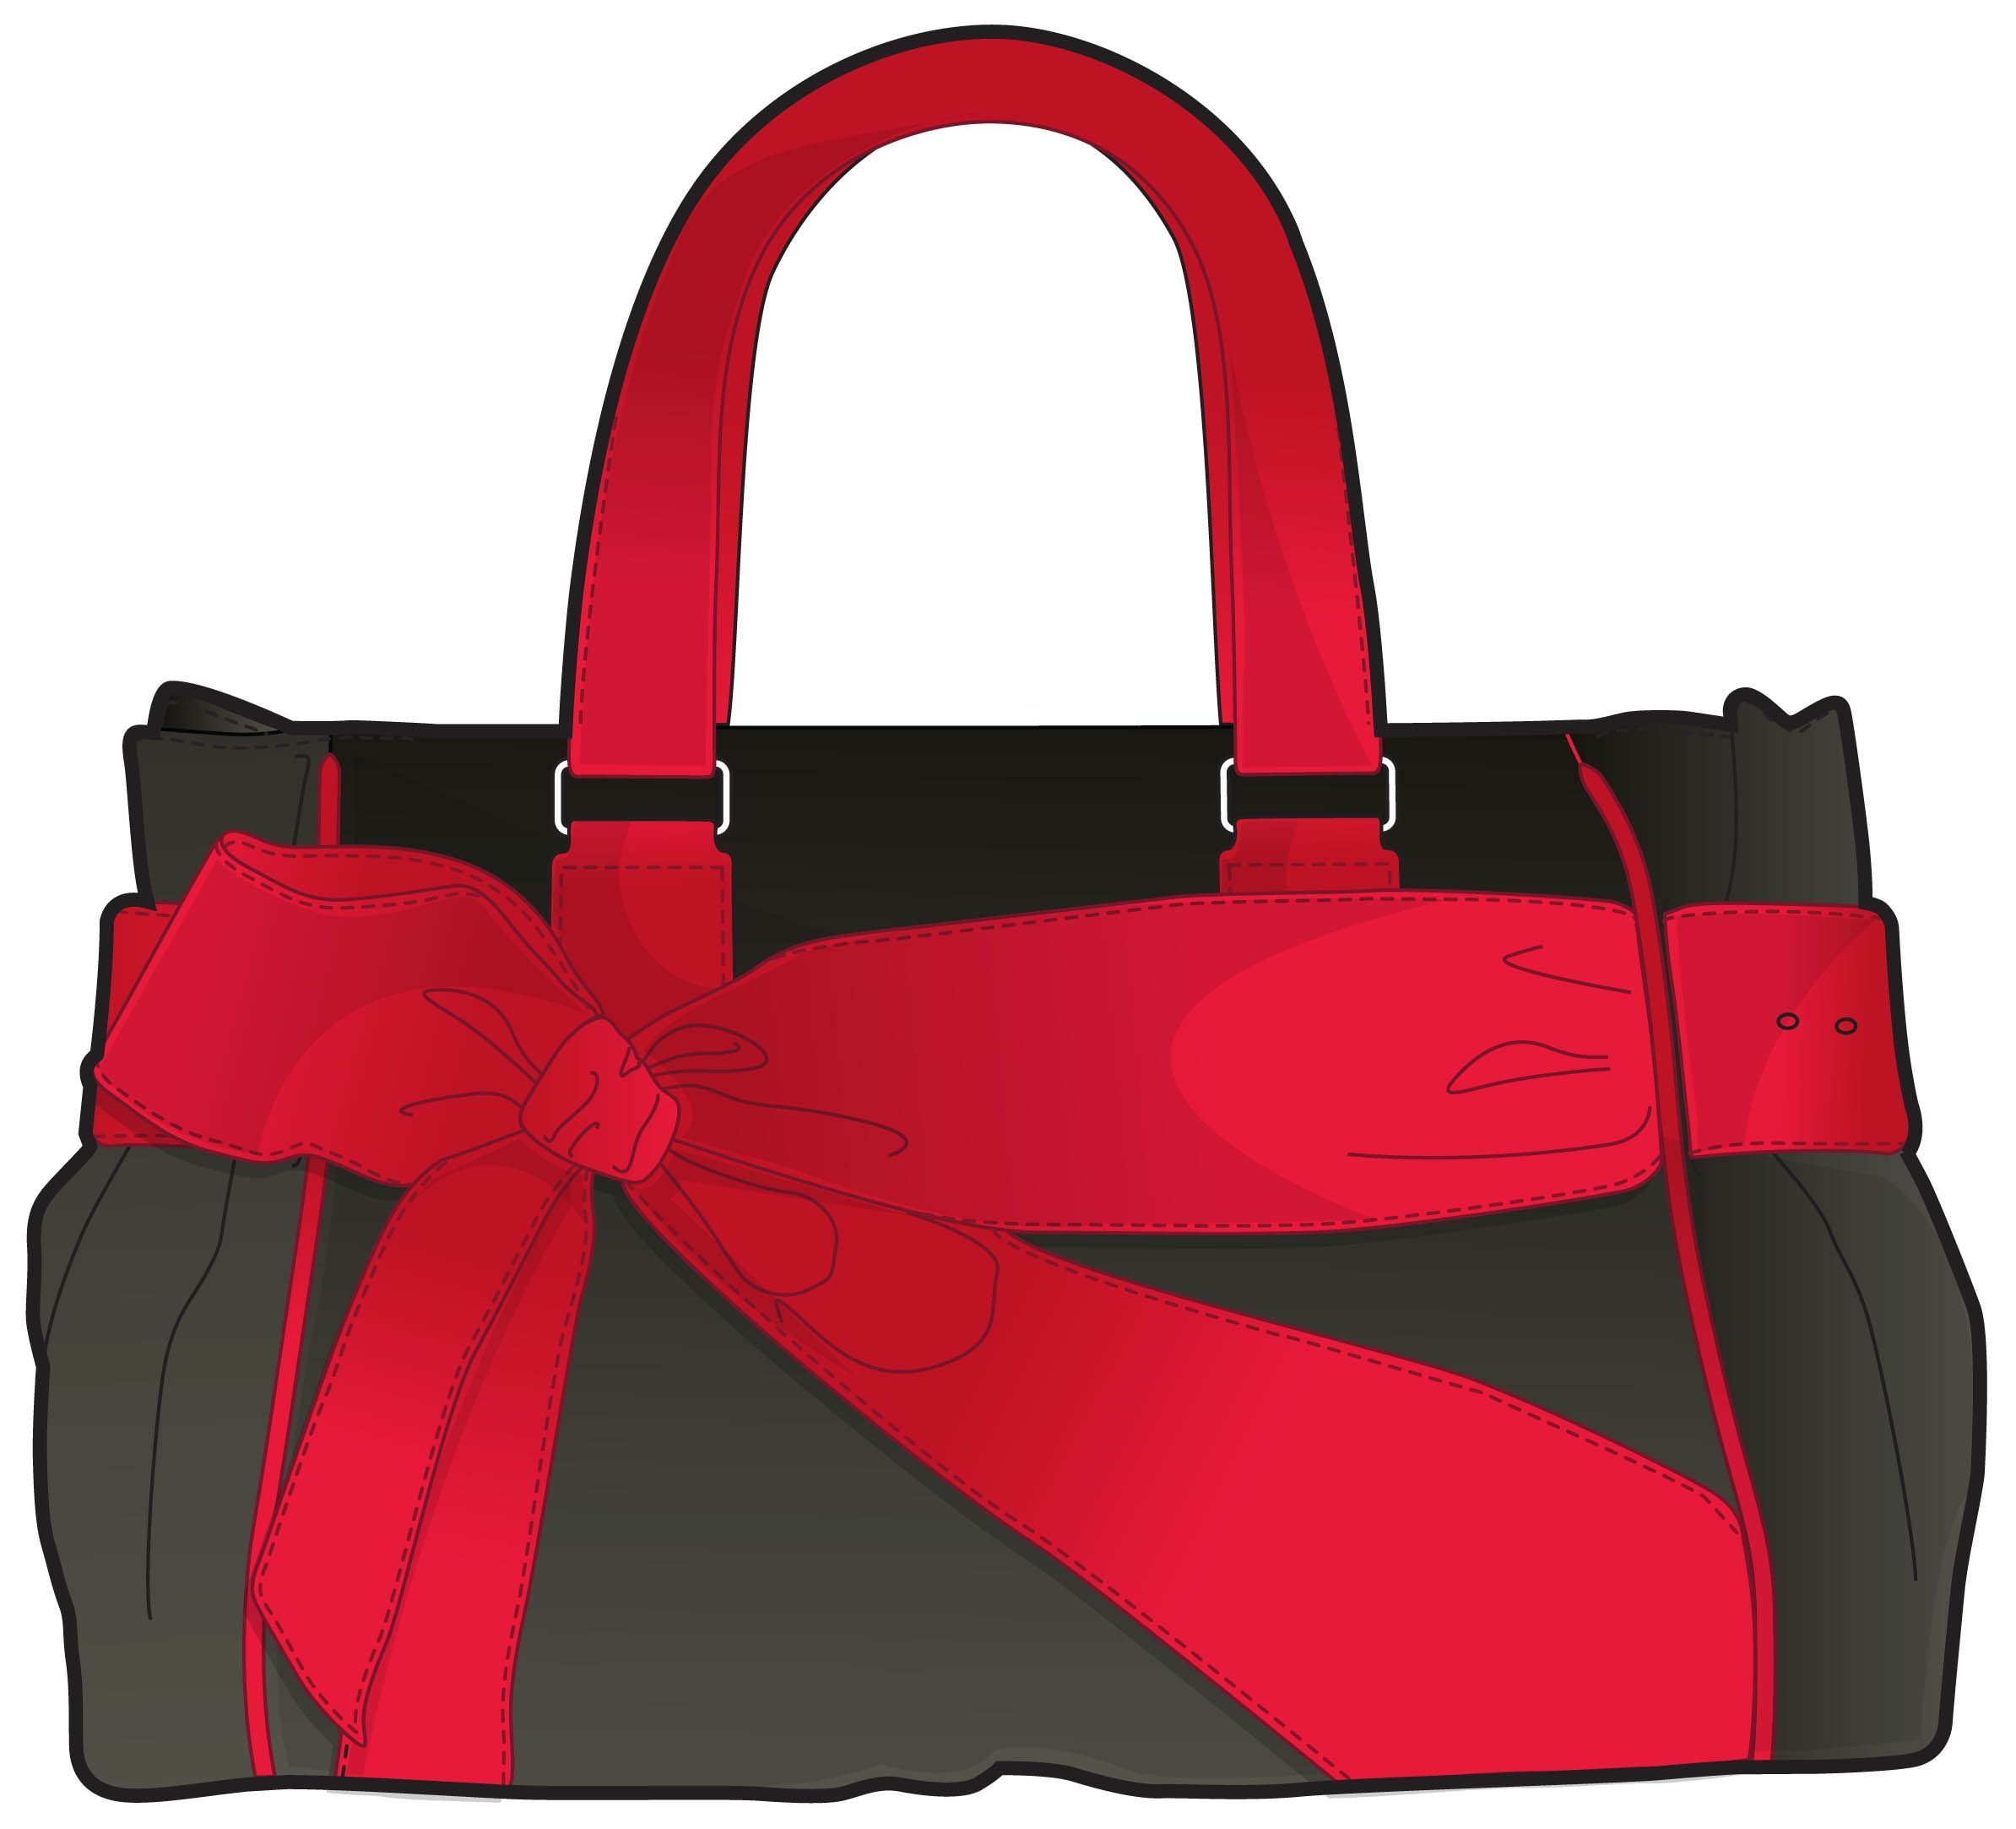 dark grey handbag with red handle and bow